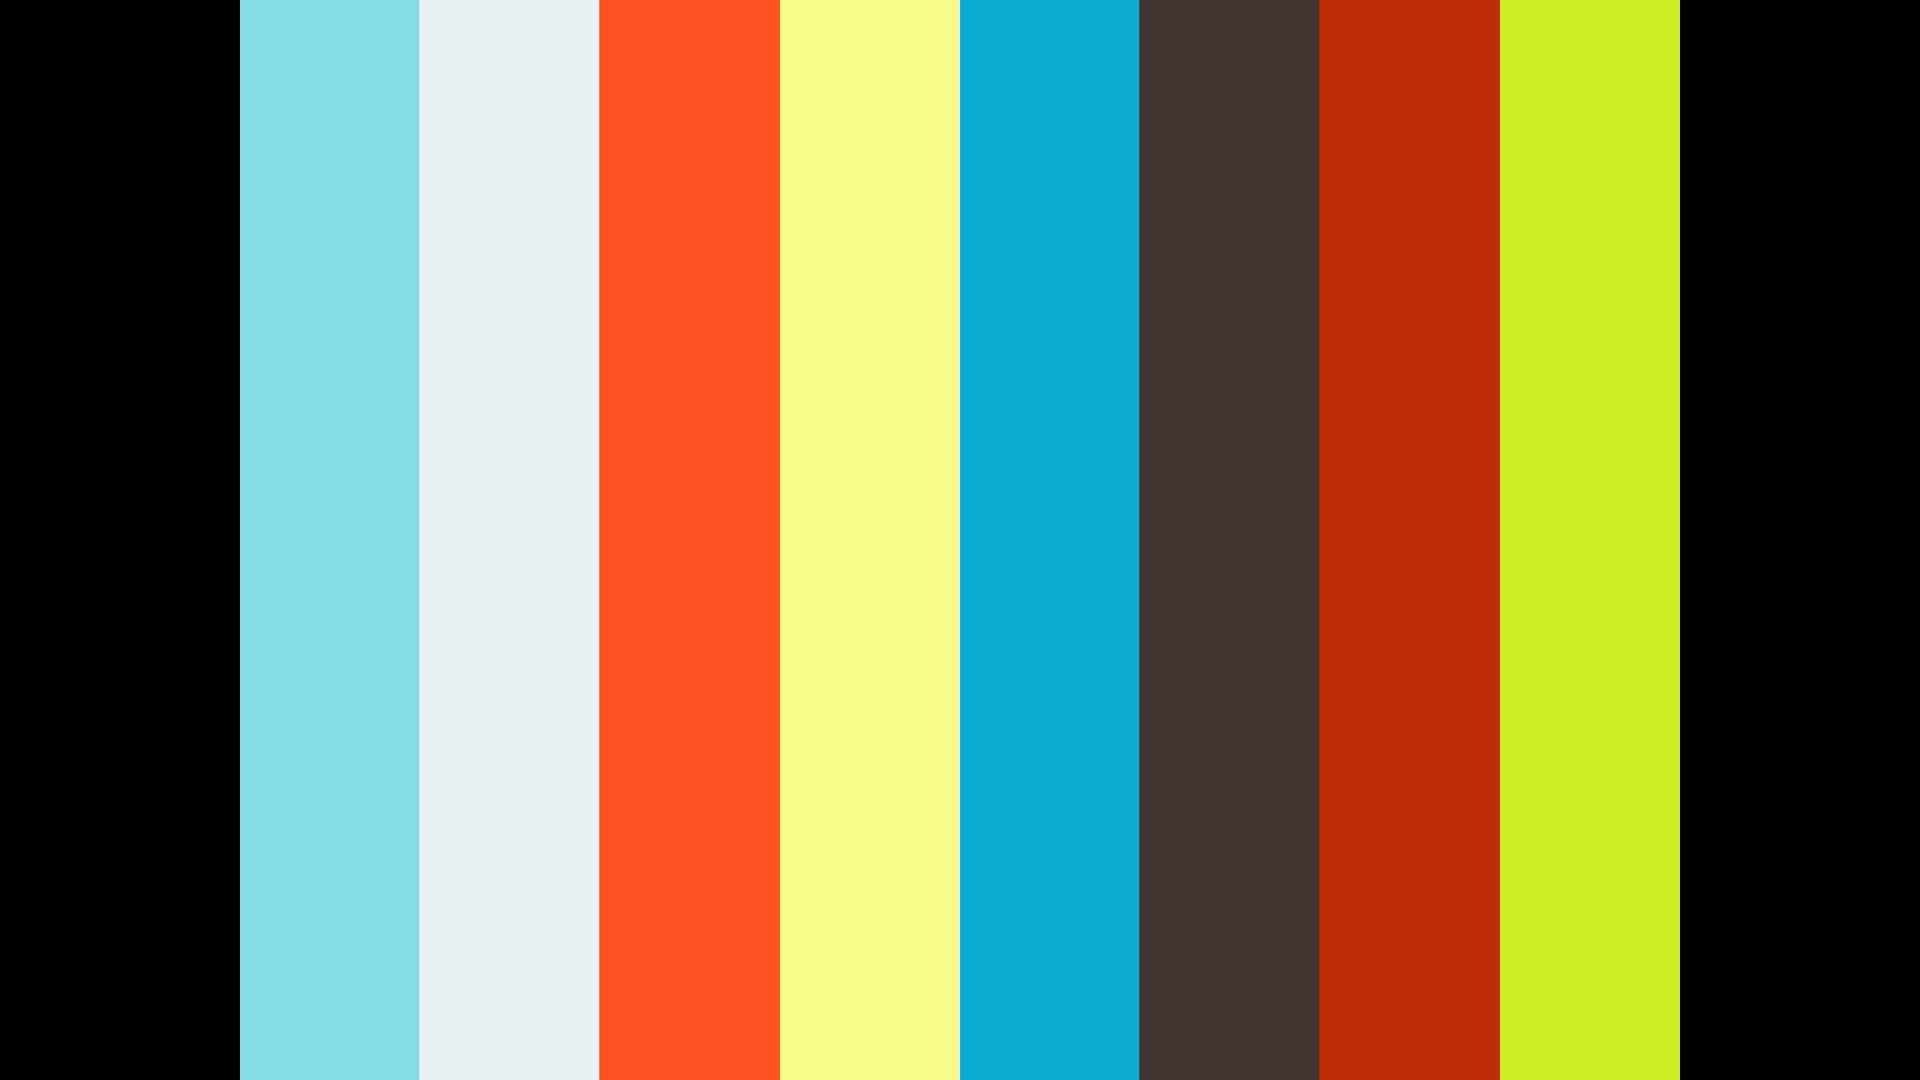 PrimeTimeNews Aug 31, 2020 – 31 August 2020 – 06-59-05 PM